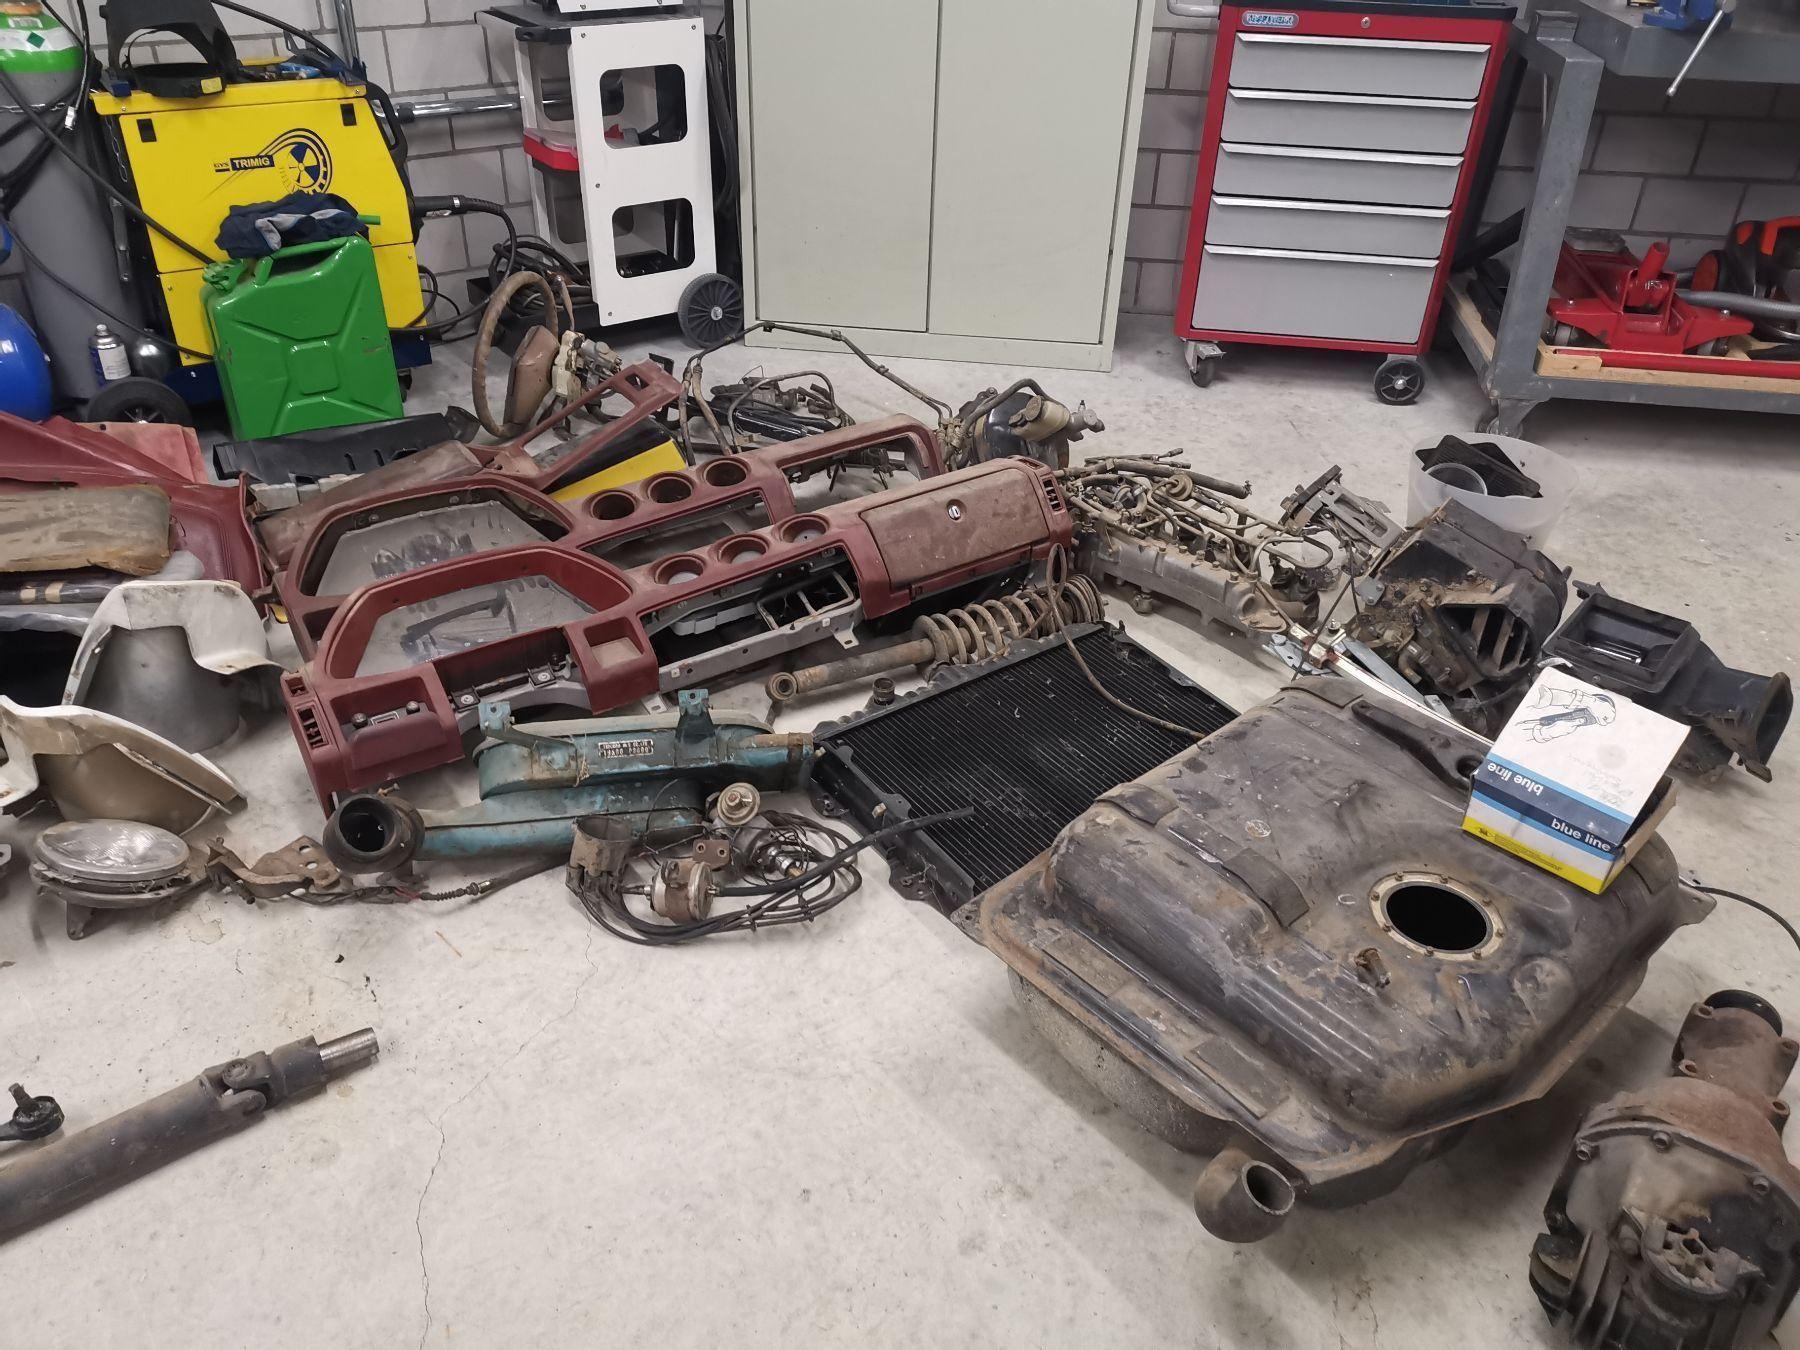 280Z parts - used - in Switzerland